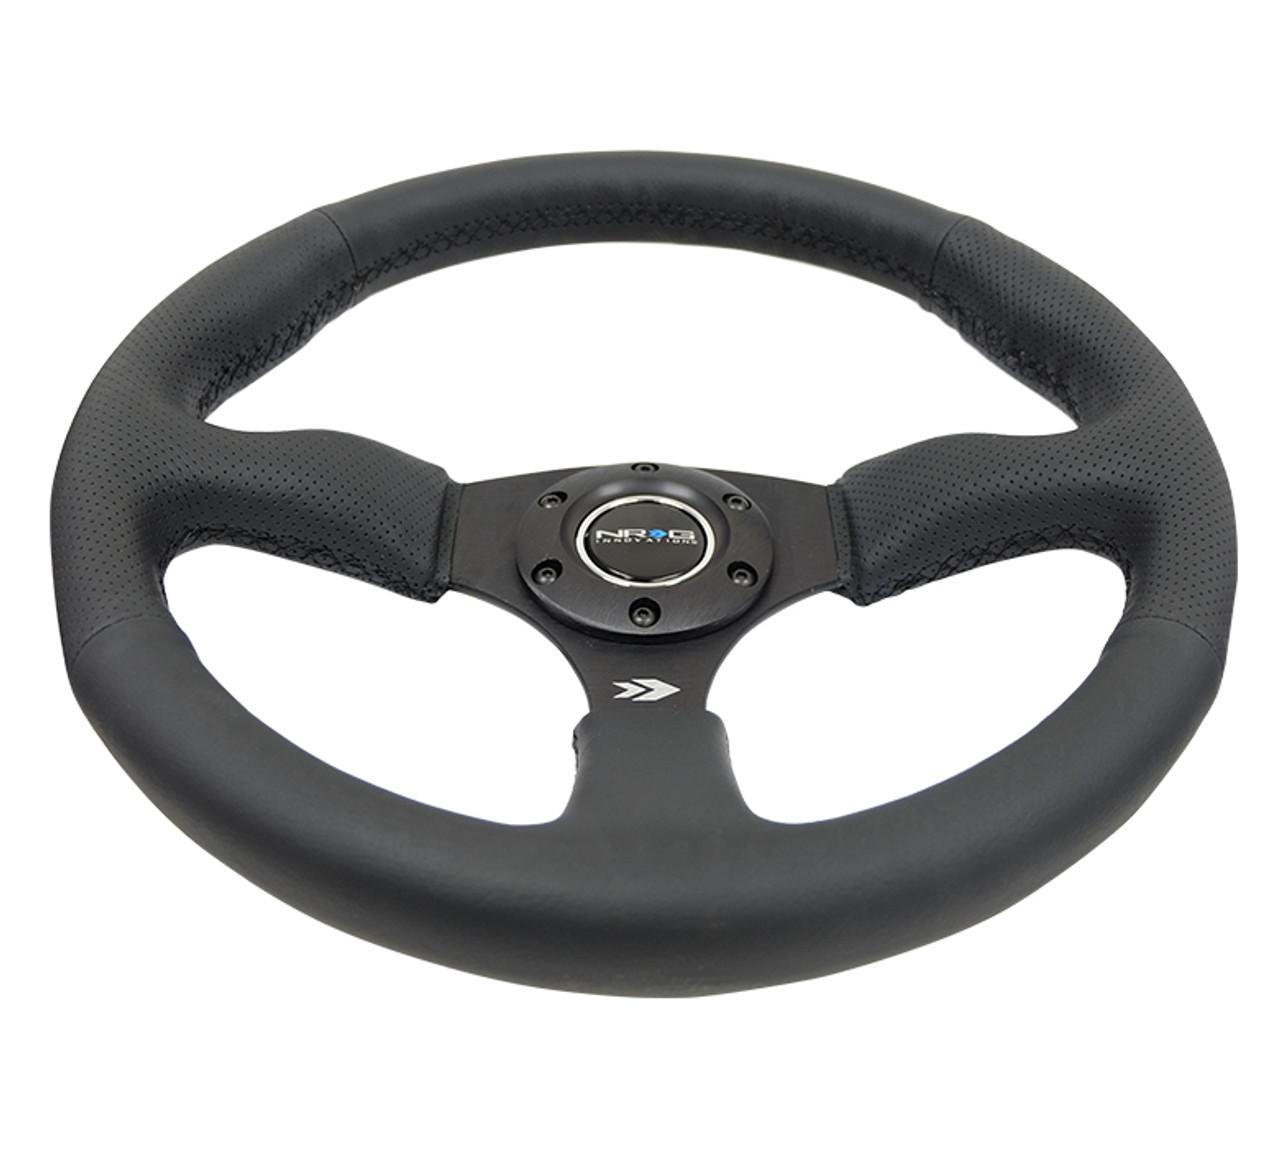 RST-023MB-R NRG Steering Wheel Real Black Leather Black Stitch 350mm Deep Dish